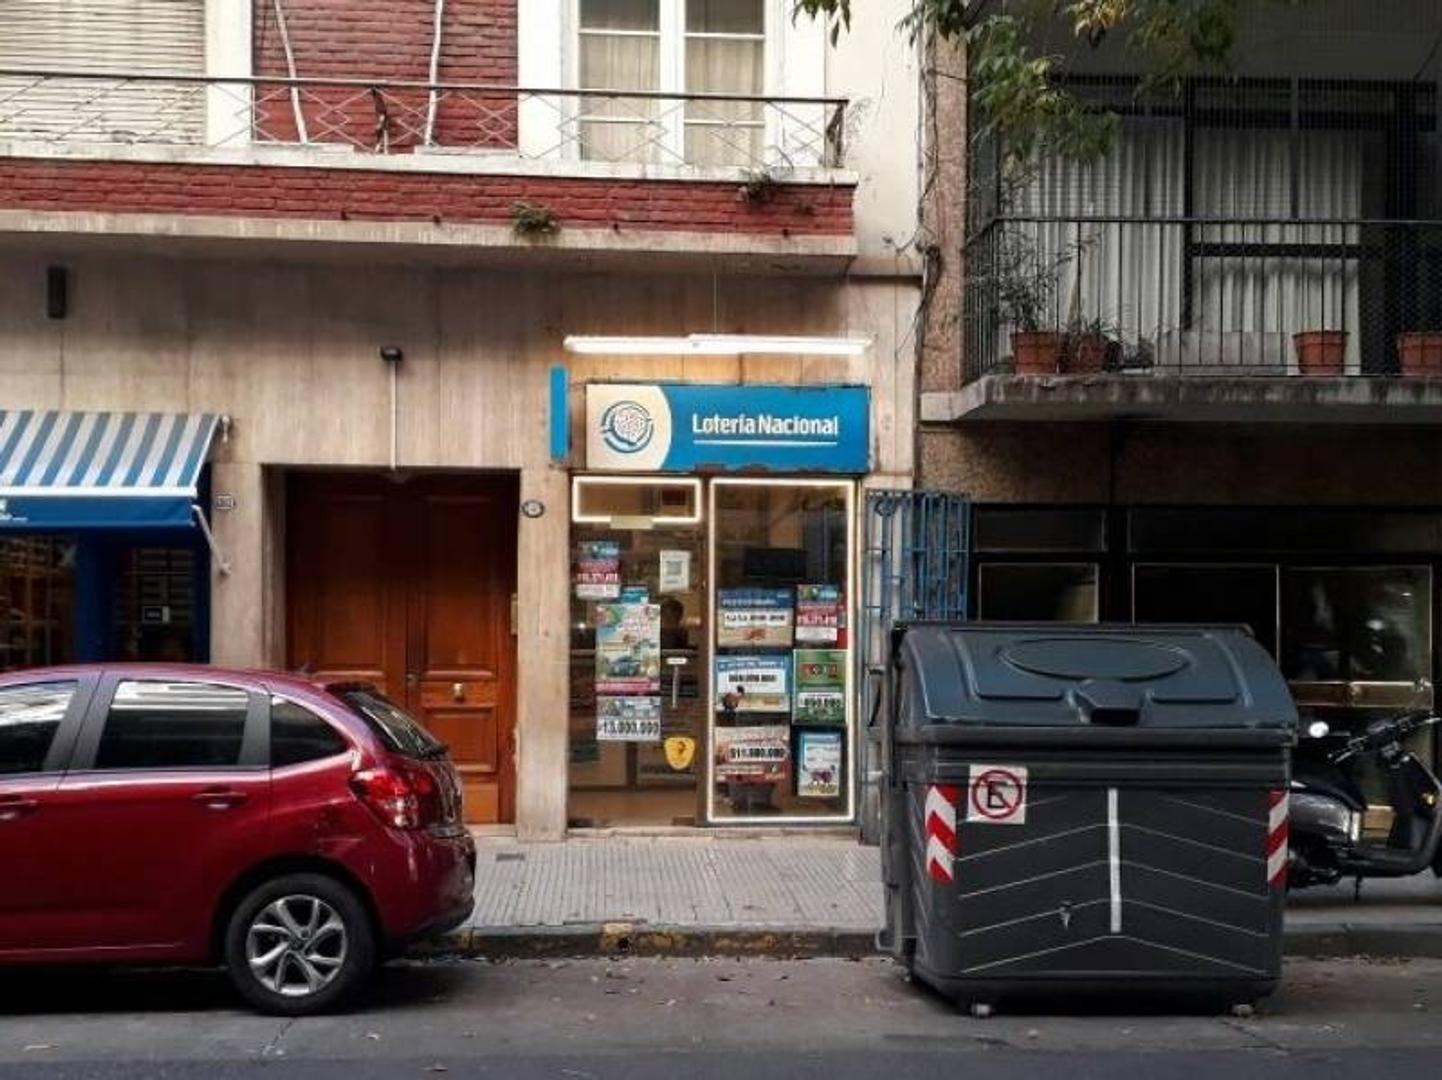 Local Comercial. Planta Baja: 2.80 x 5.50 m. A metros de calle Uruguay